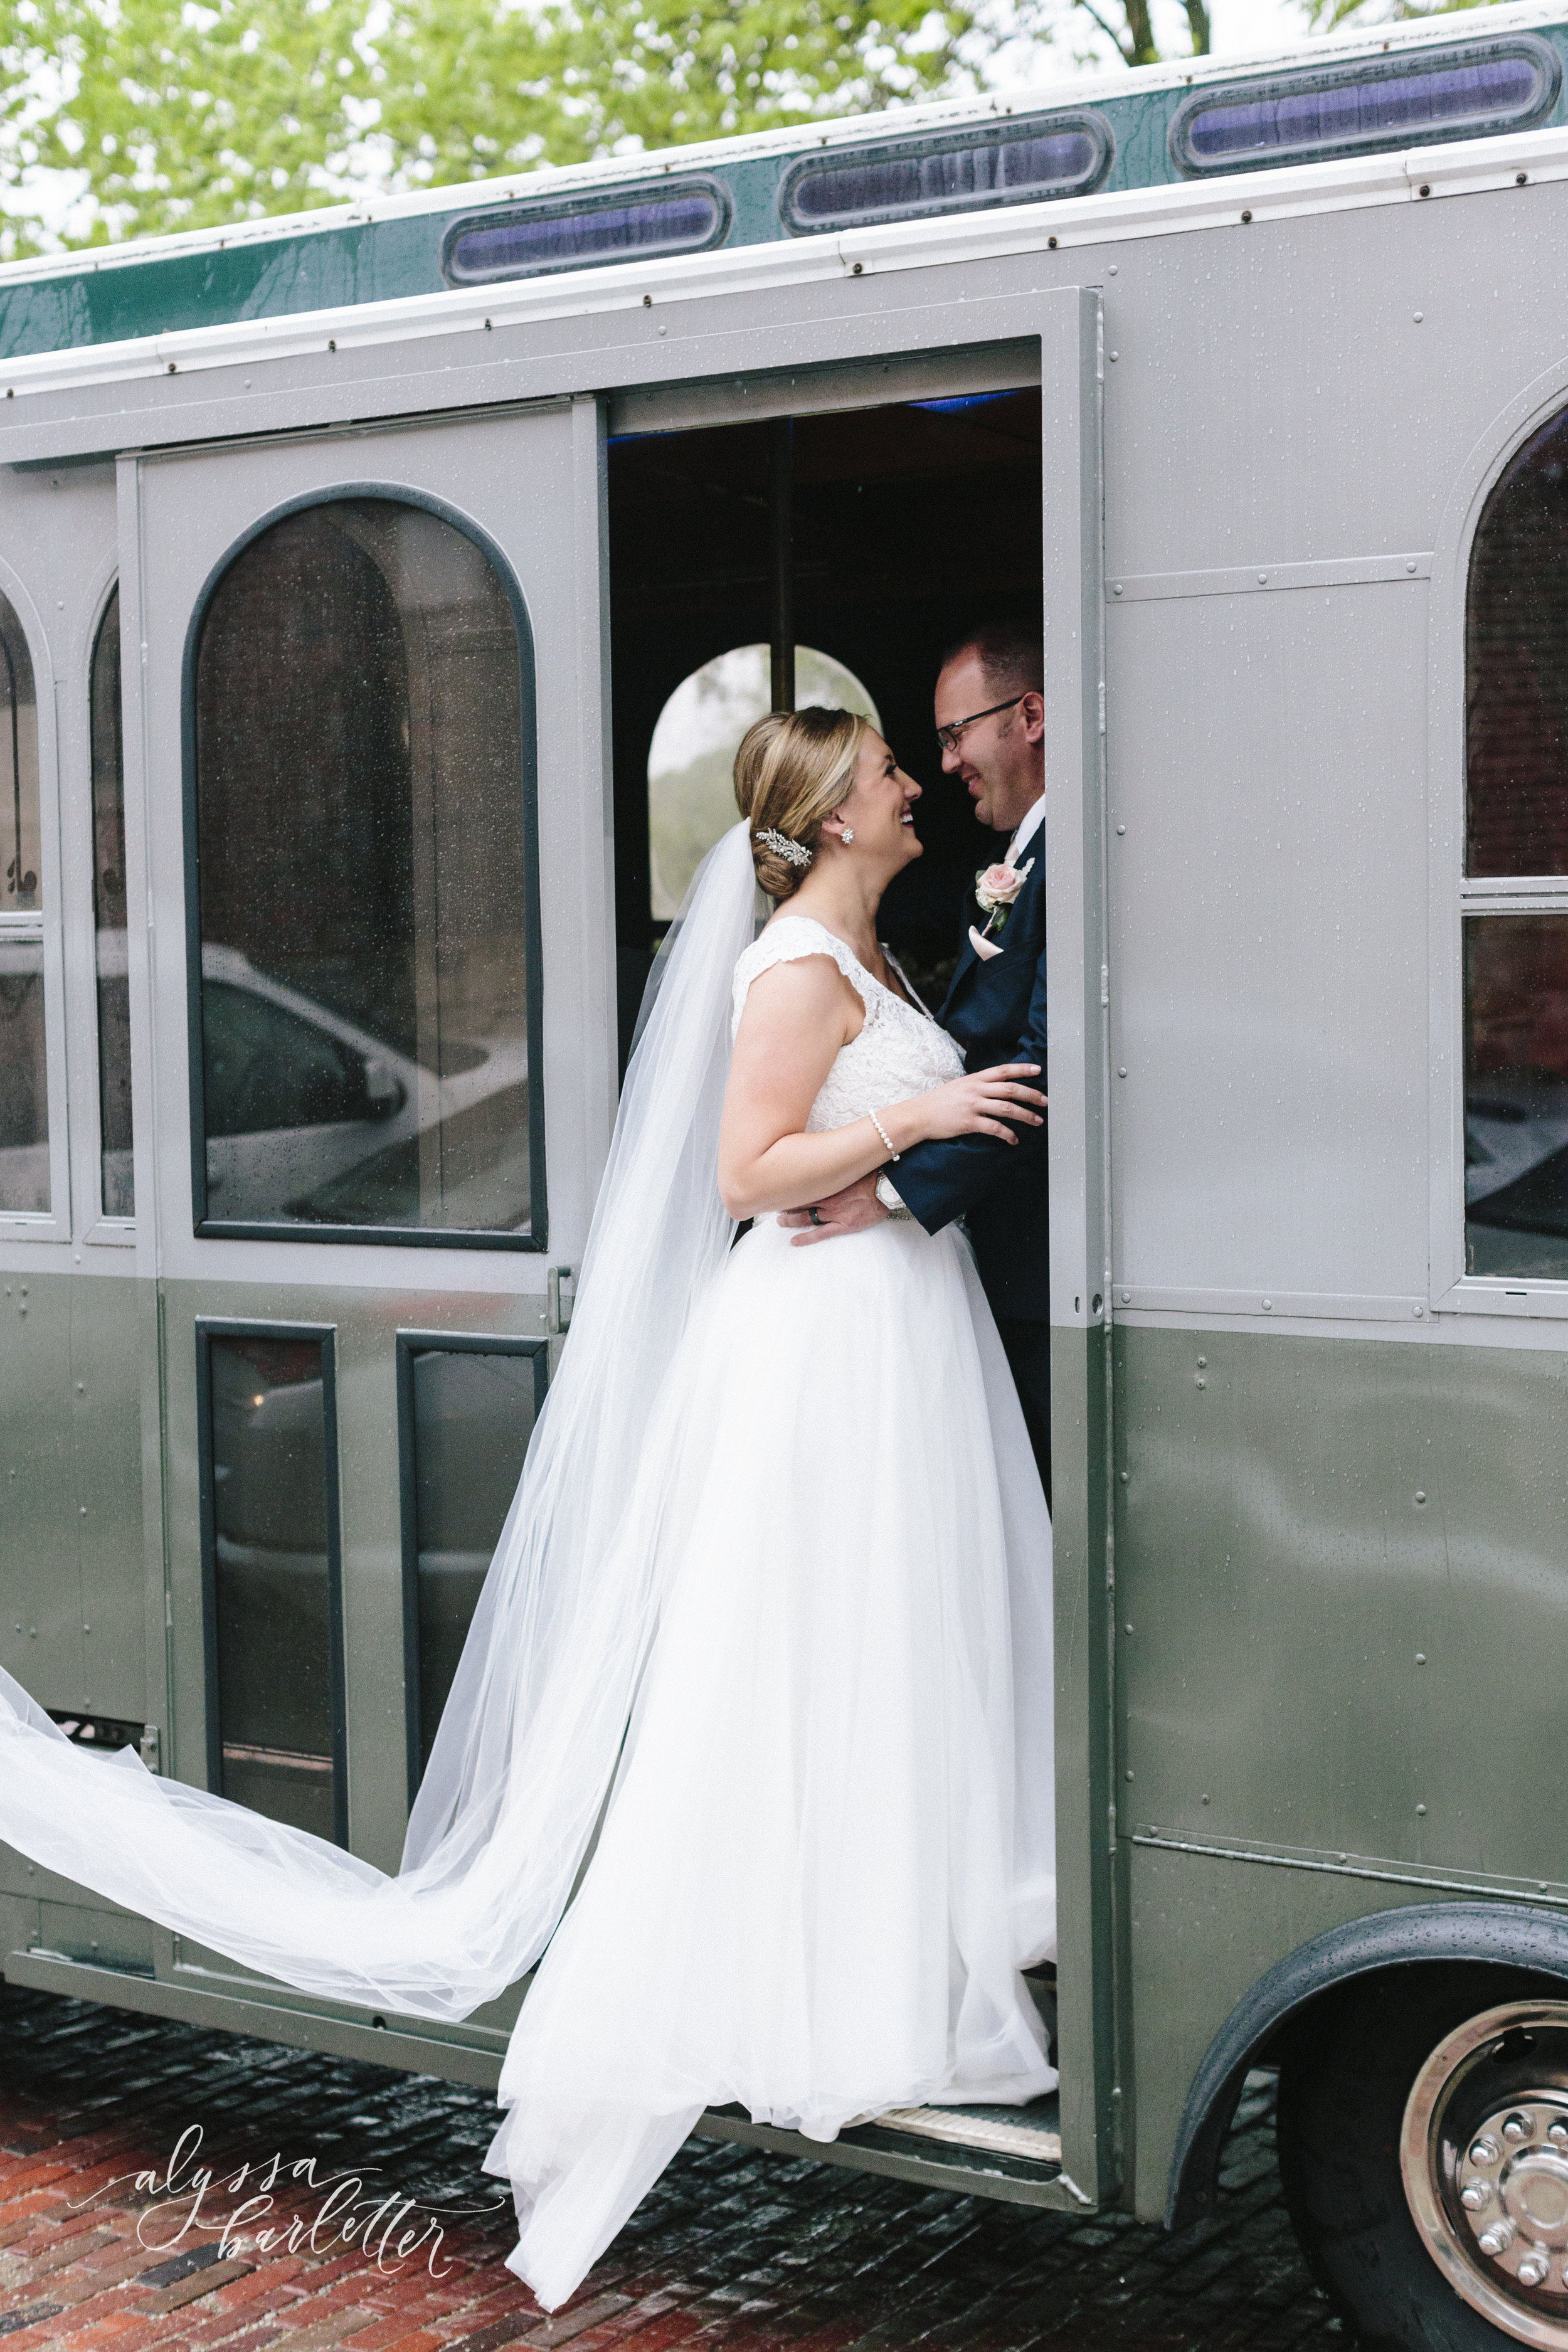 alyssa barletter photography cider gallery lawrence kansas rainy day wedding megan and brett-1-29.jpg